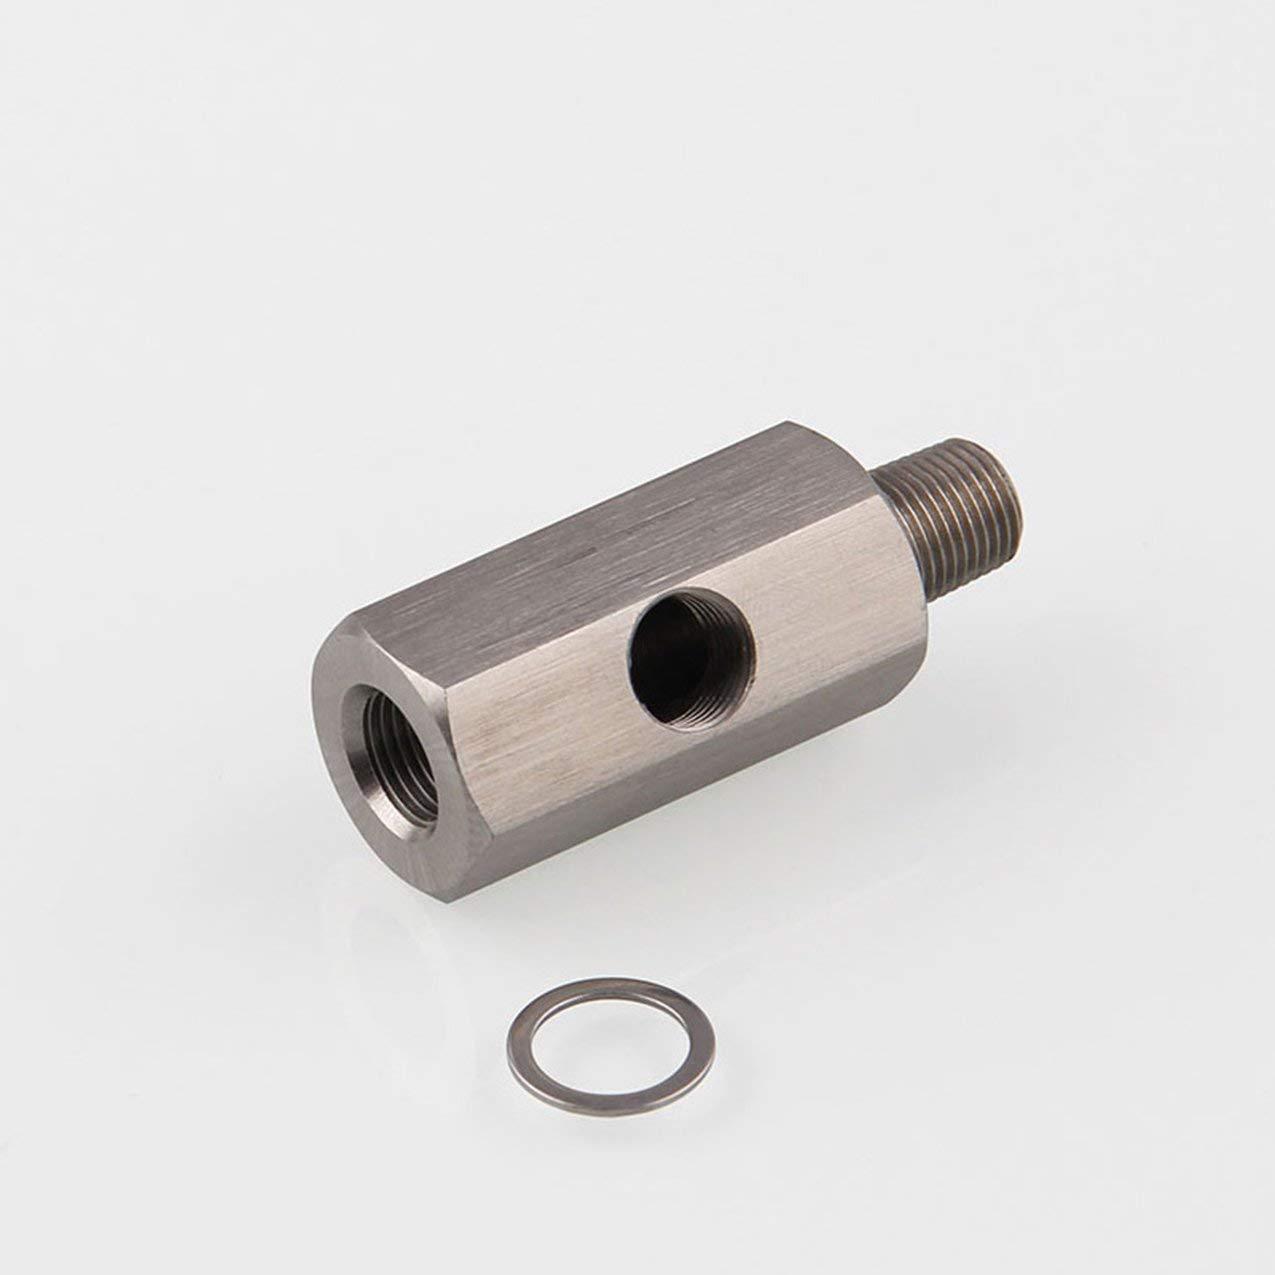 1//8 Bspt Oil Pressure Sensor Tee to Npt Adapter Turbo Supply Feed Line Gauge Market Trend Gold